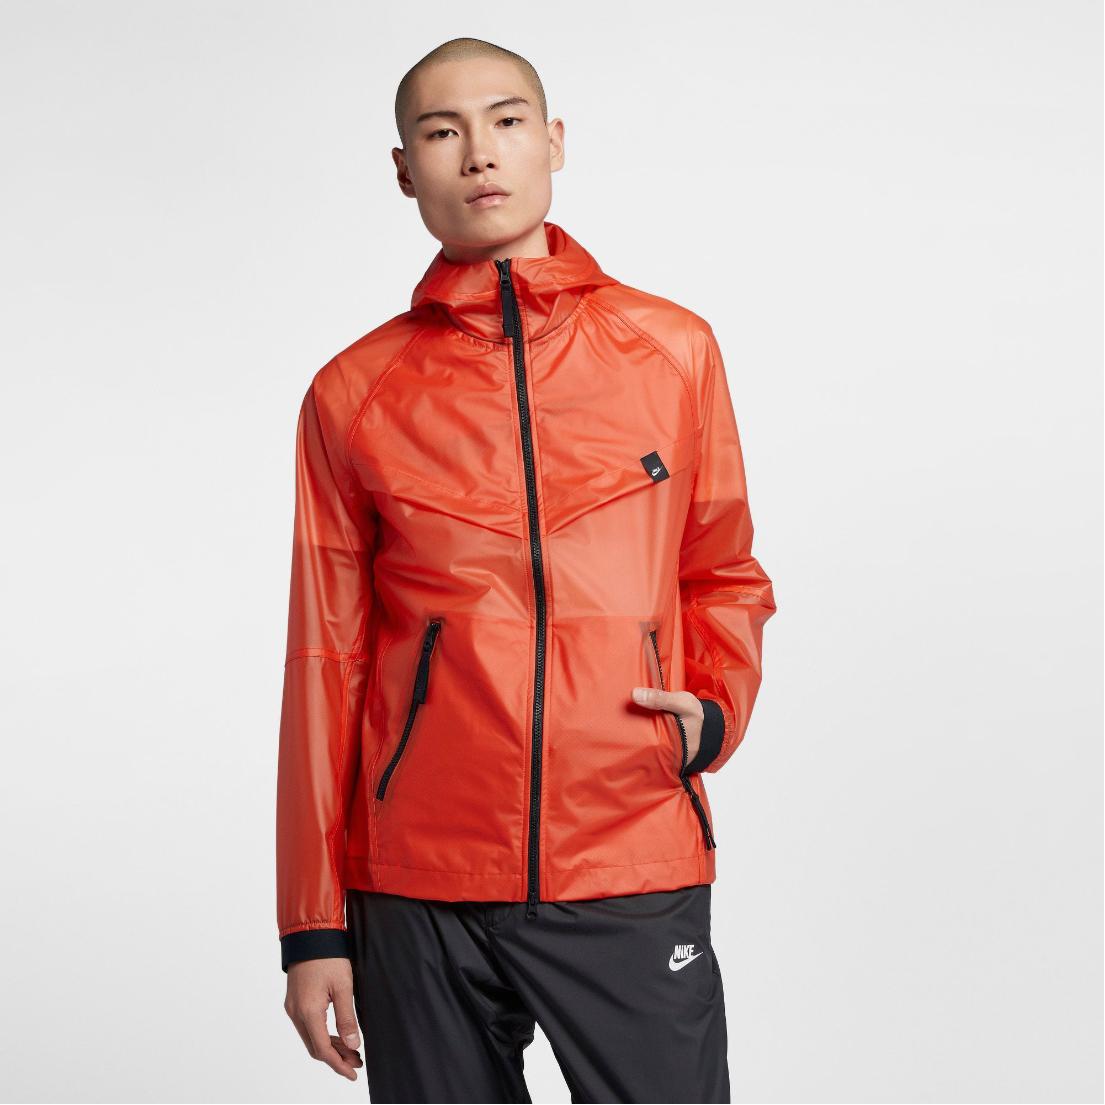 nike-air-safari-orange-jacket-1